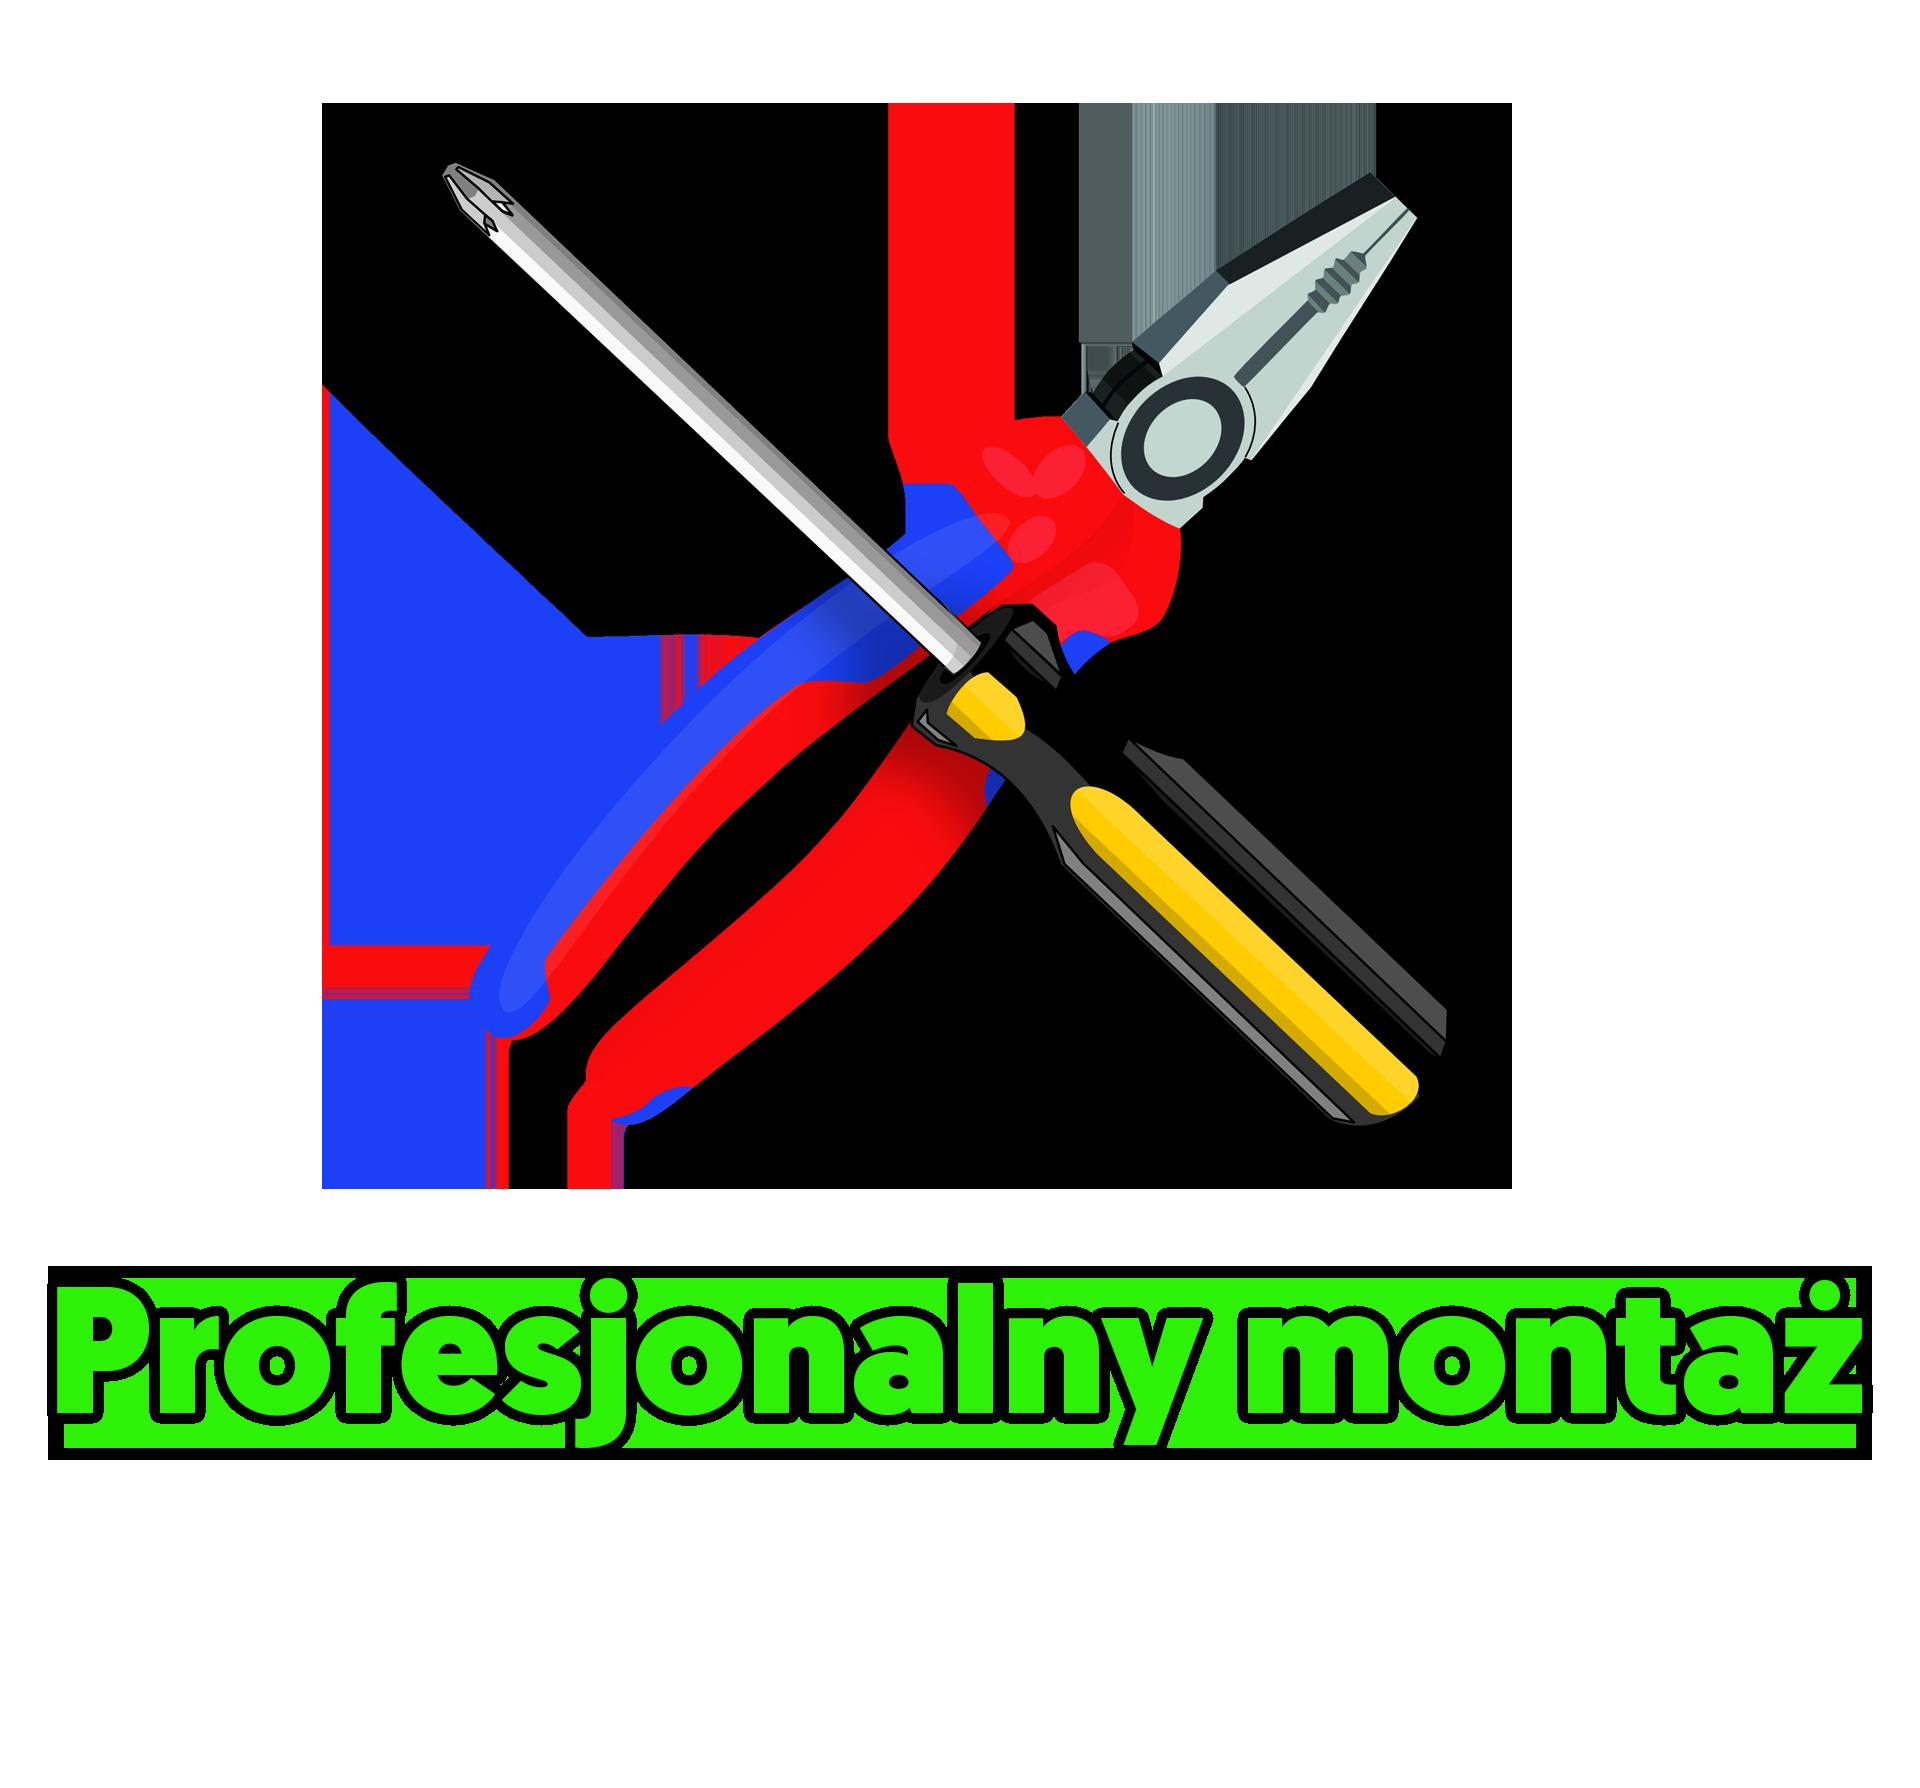 profesjonalny montaż.png